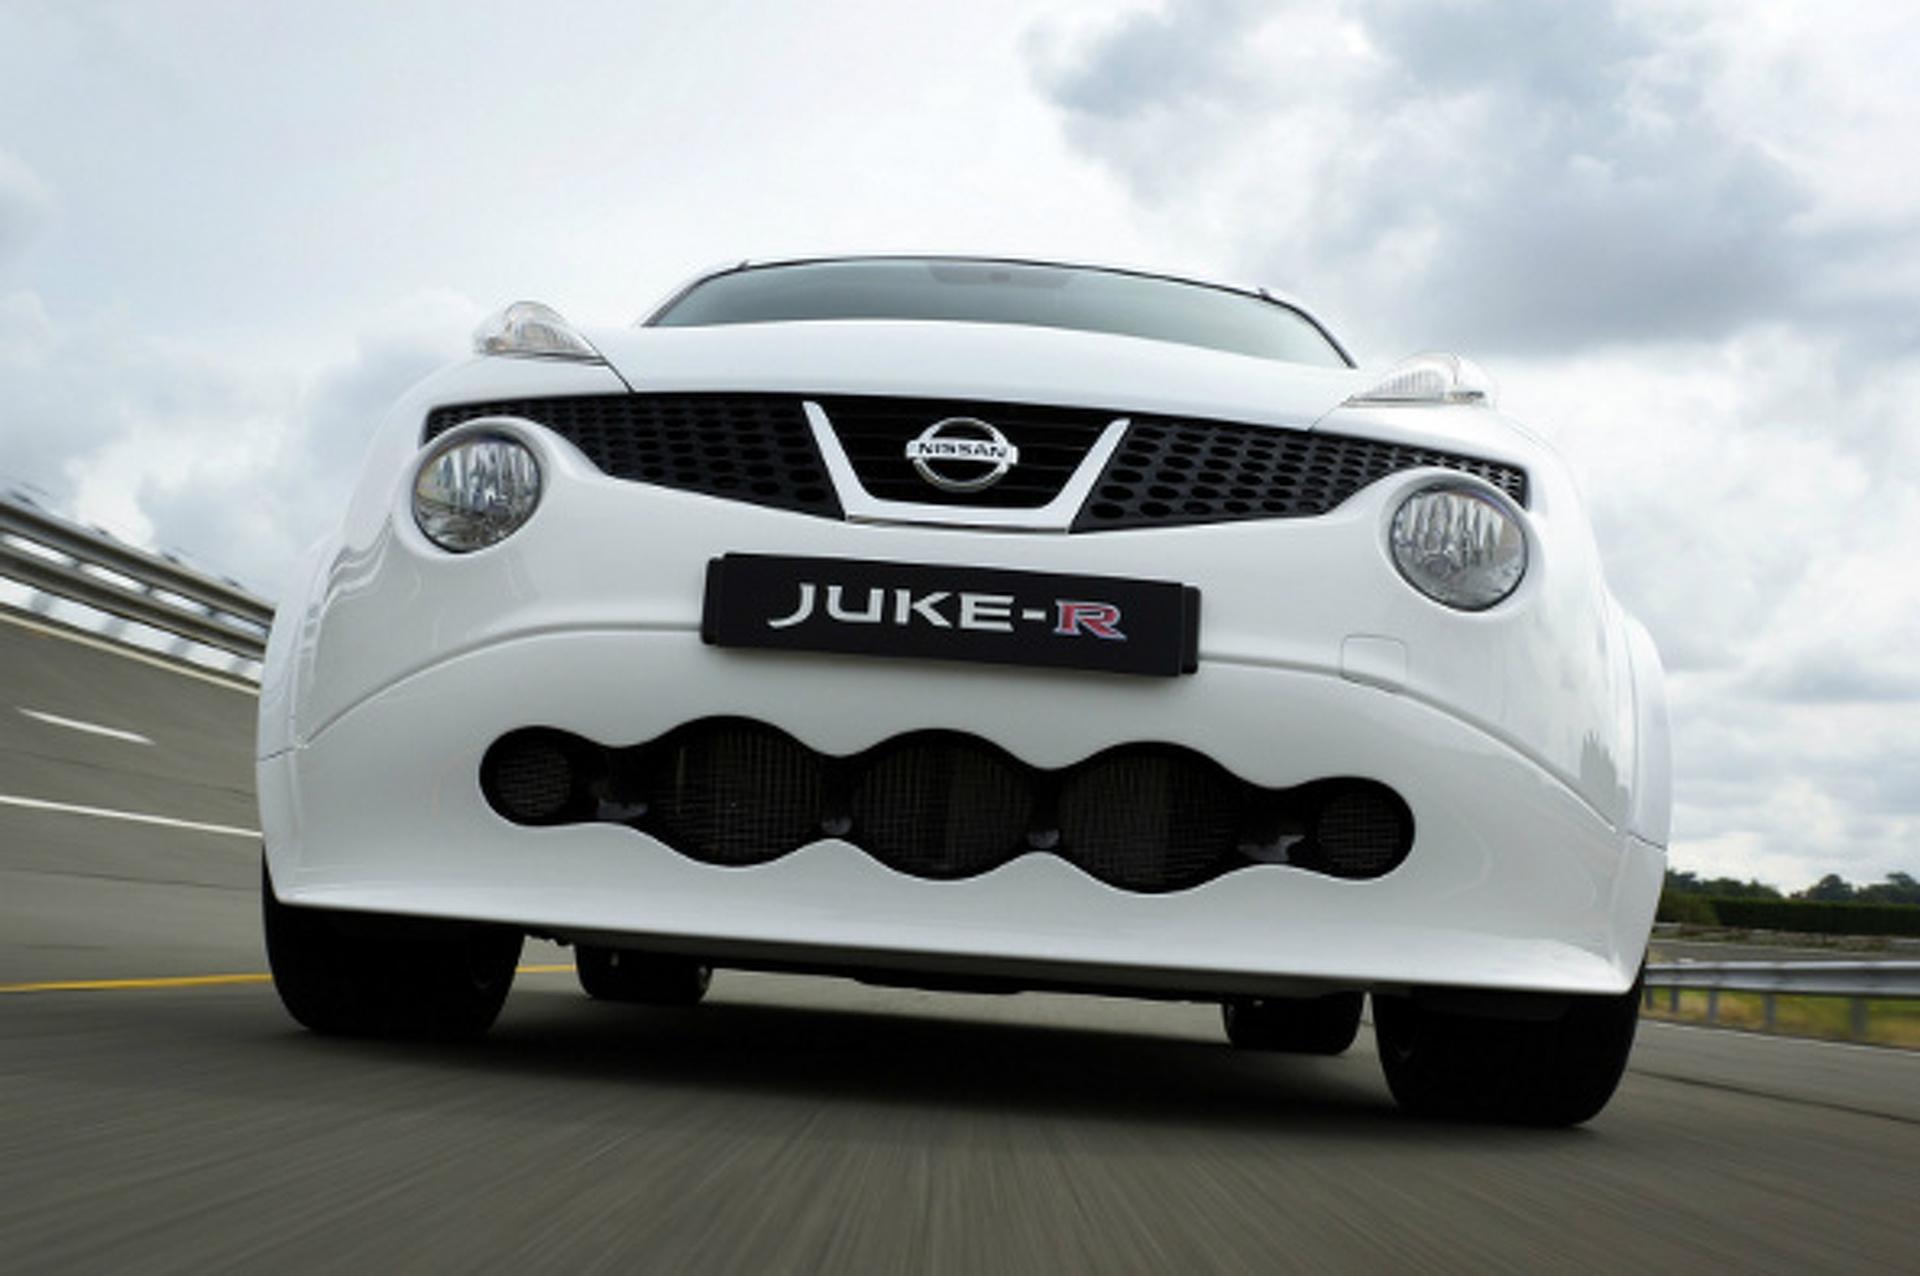 $600,000 Nissan Juke-R Crashed On Test Drive